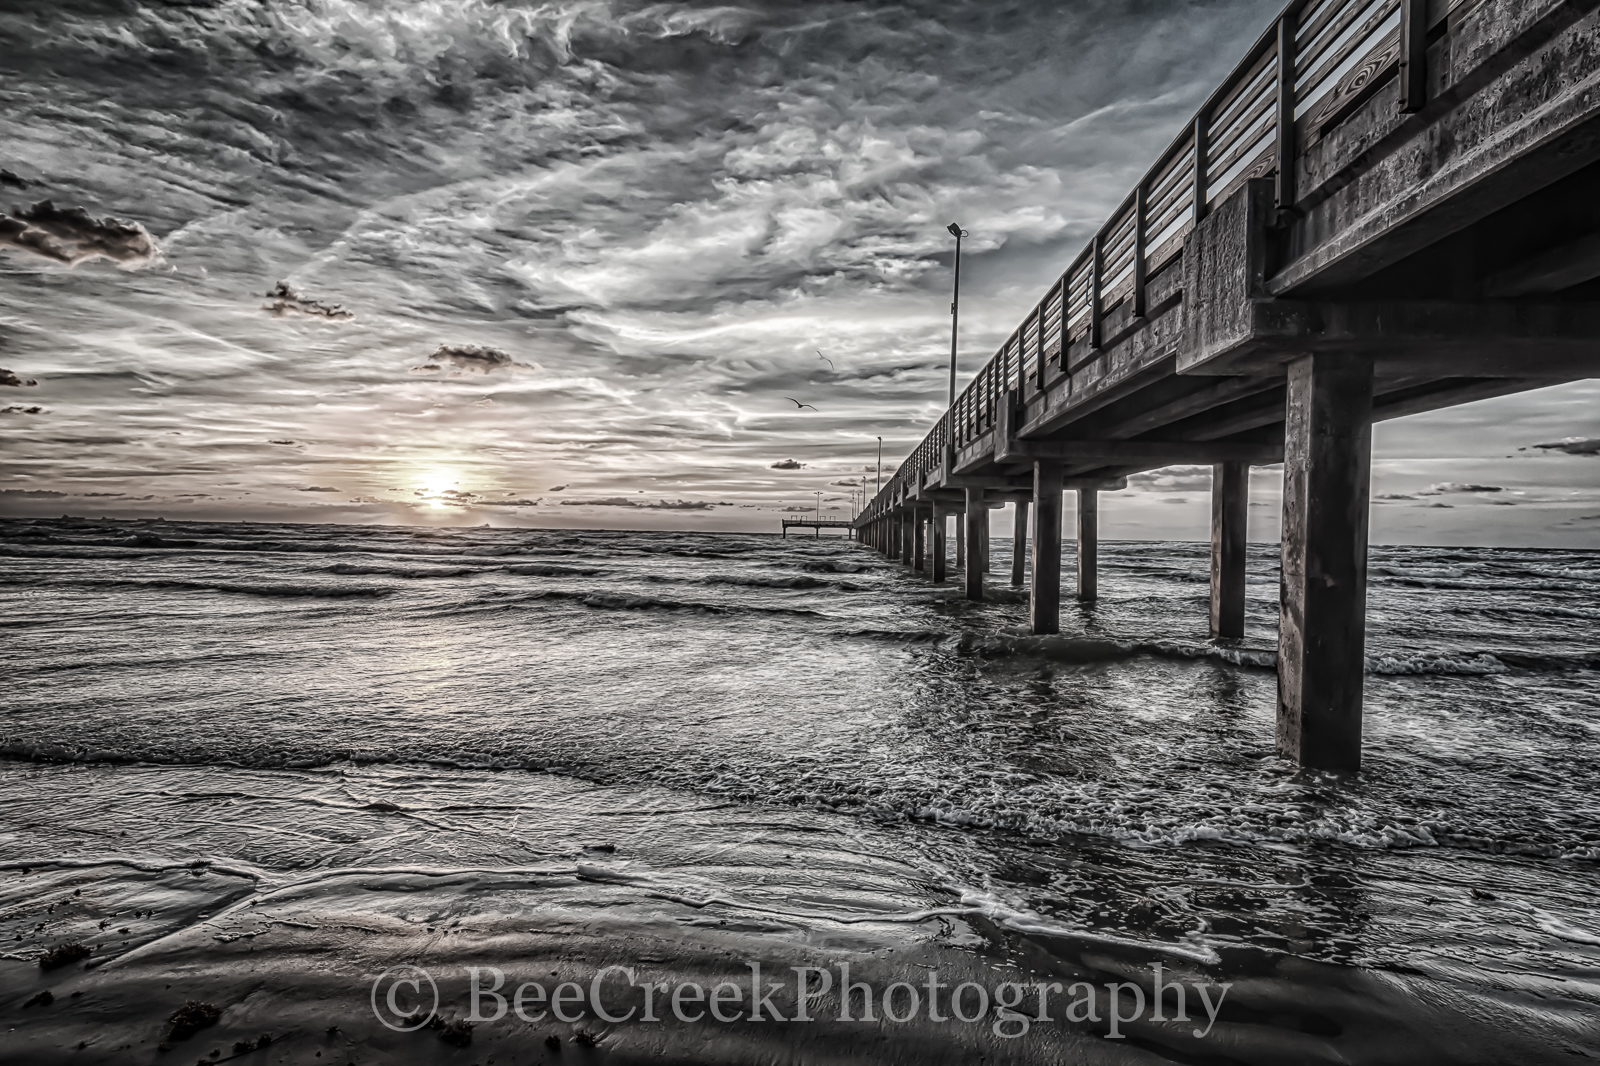 Sunrise, beach, black and white, clouds, coast, coastal, fishing pier, gulf, sand, surf, texas, texature, wooden, photo